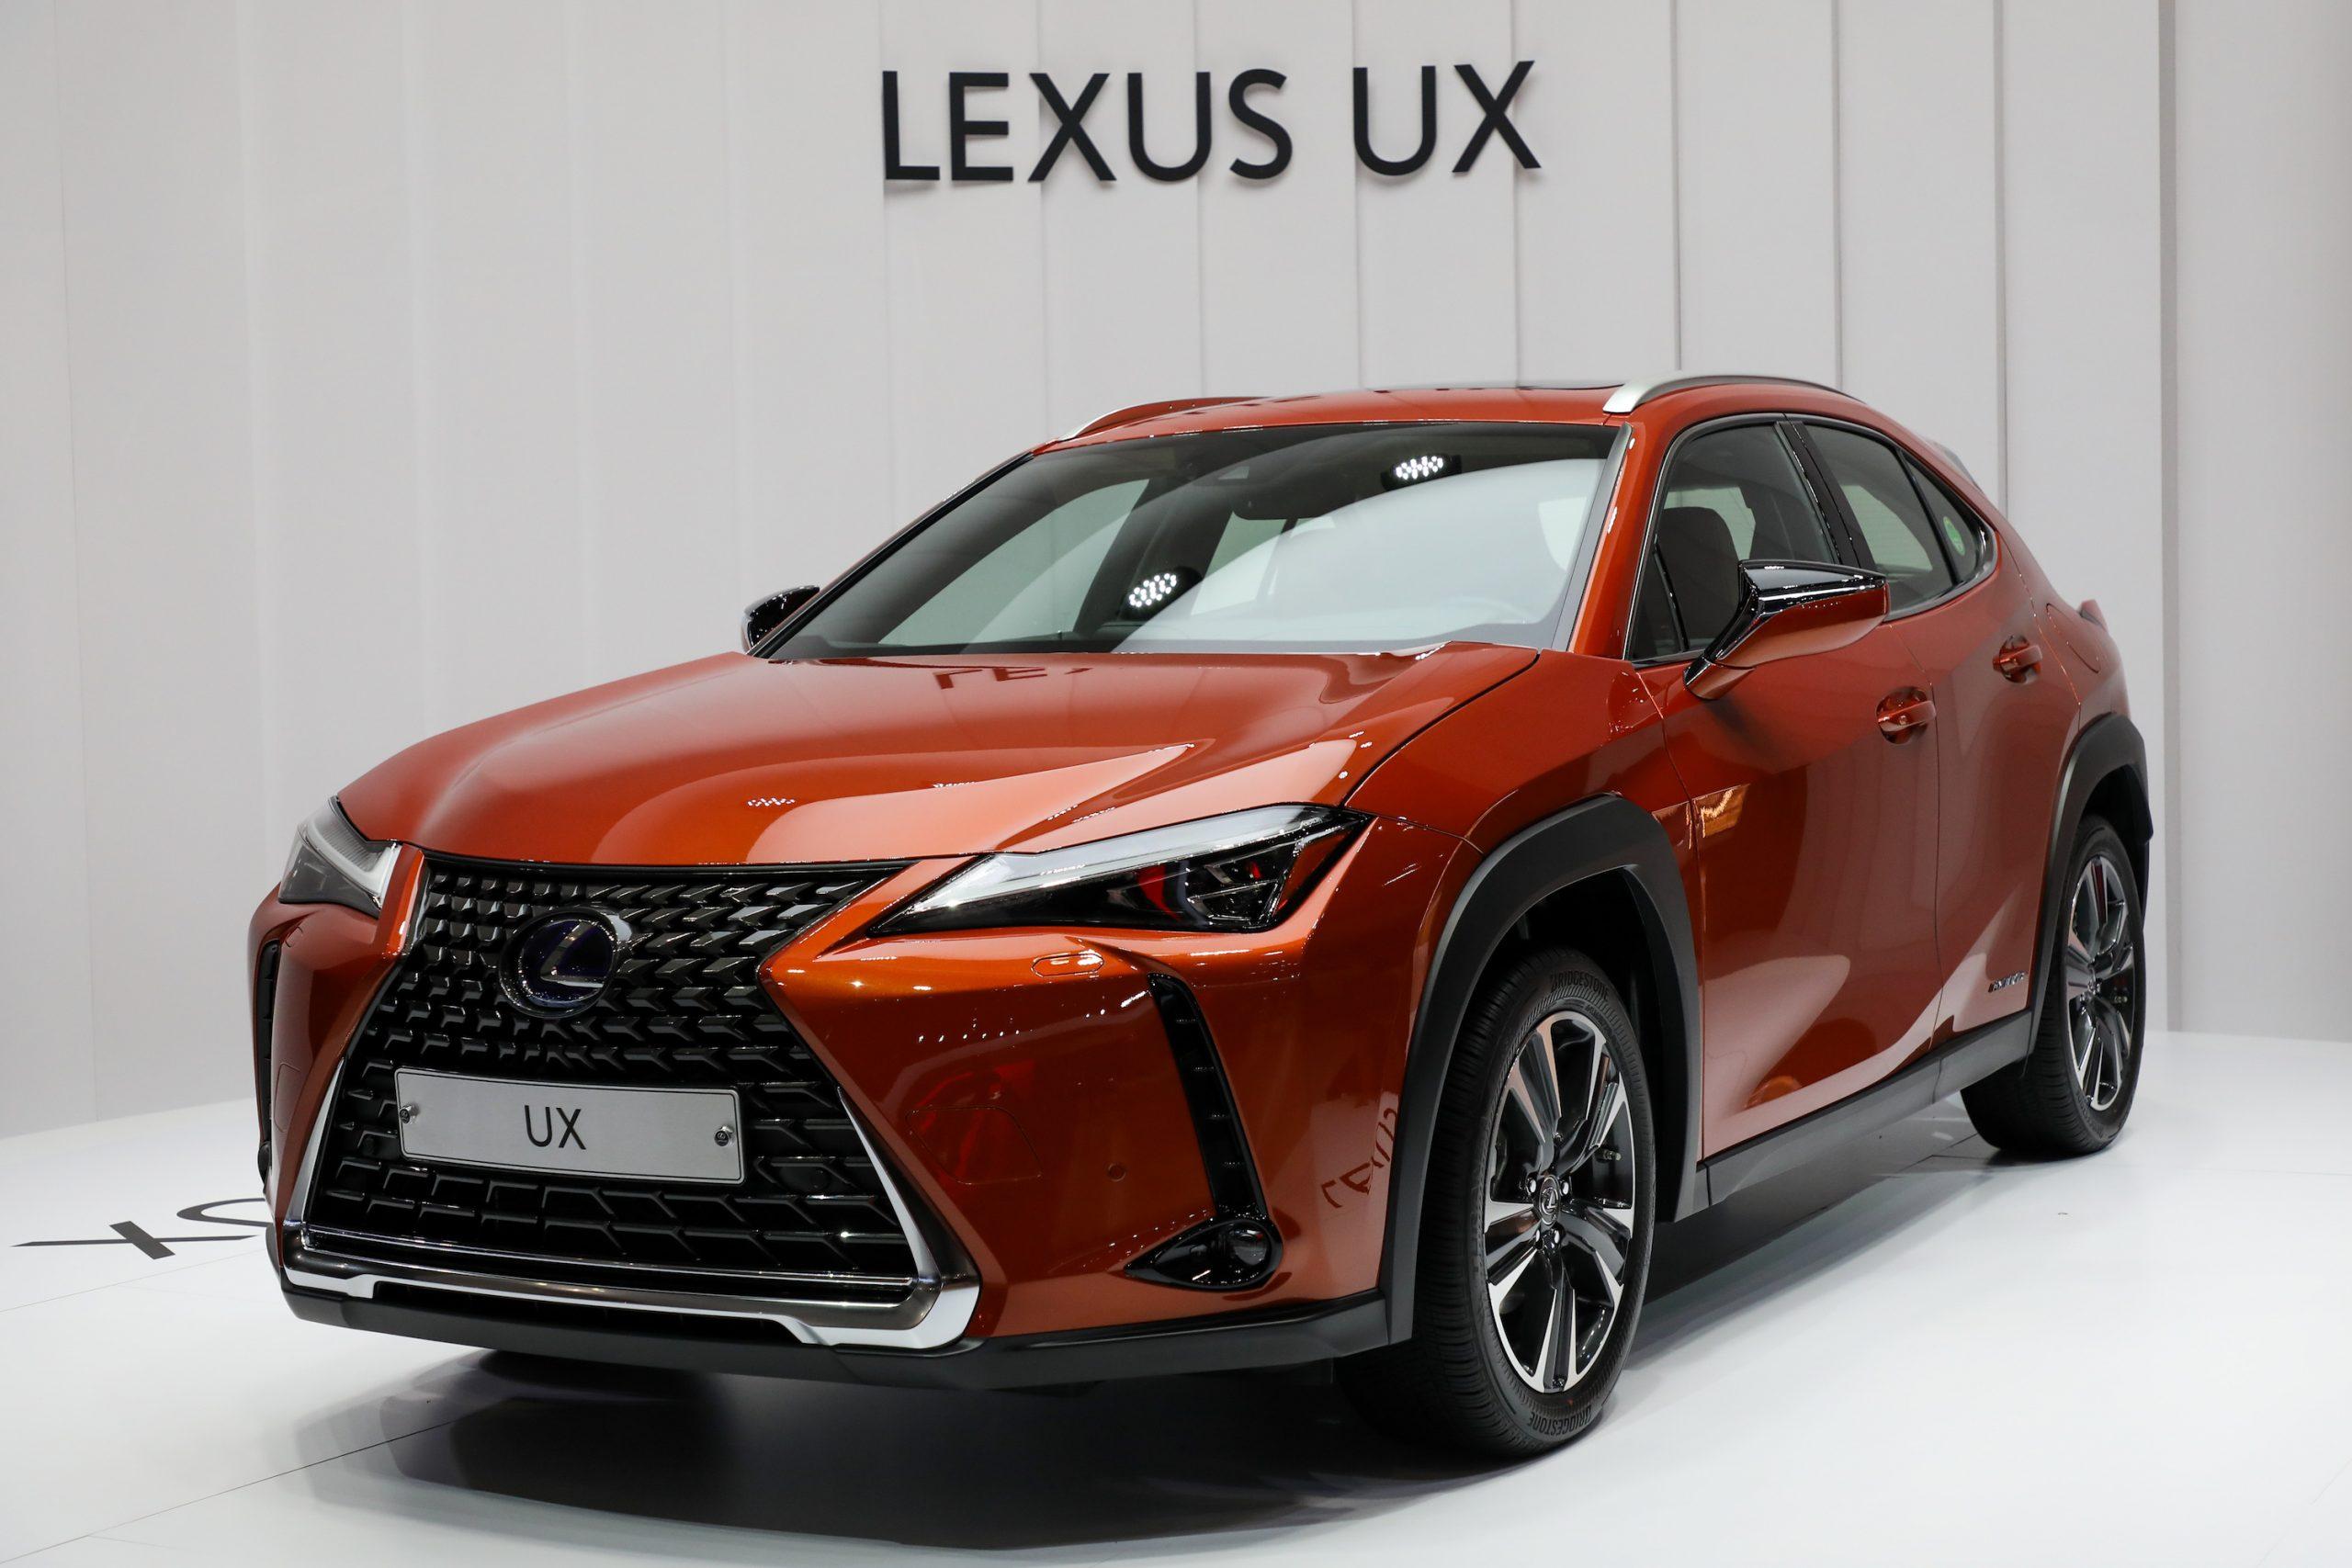 3 Big Flaws Plague the 2021 Lexus UX Hybrid